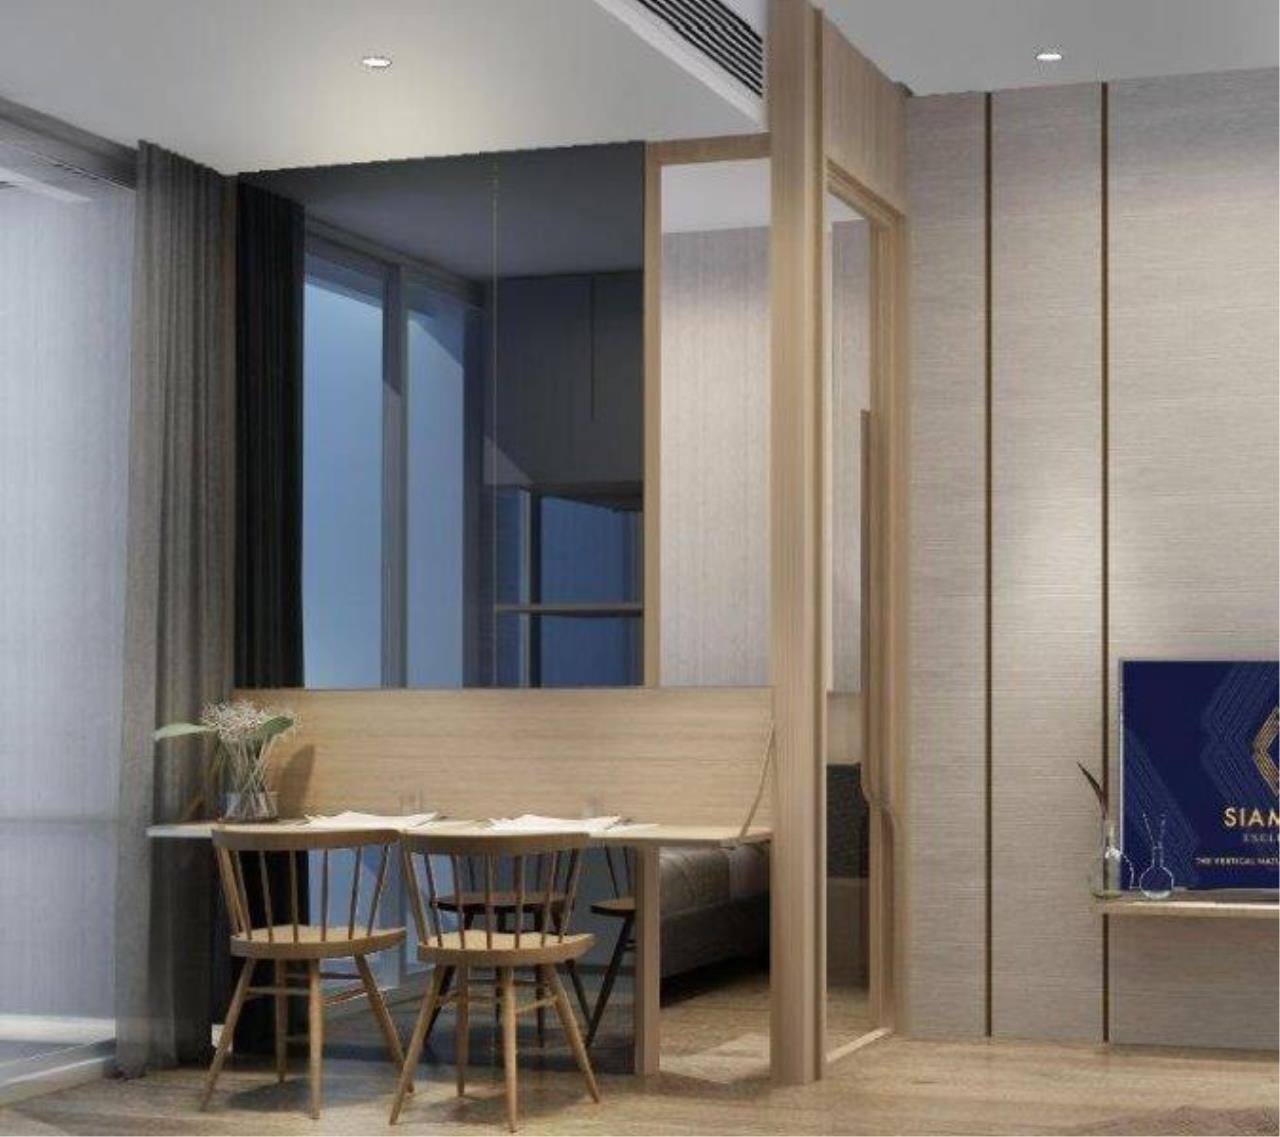 Century21 Skylux Agency's Siamese Exclusive Sukhumvit 42 / Condo For Sale / 1 Bedroom / 34.74 SQM / BTS Ekkamai / Bangkok 4